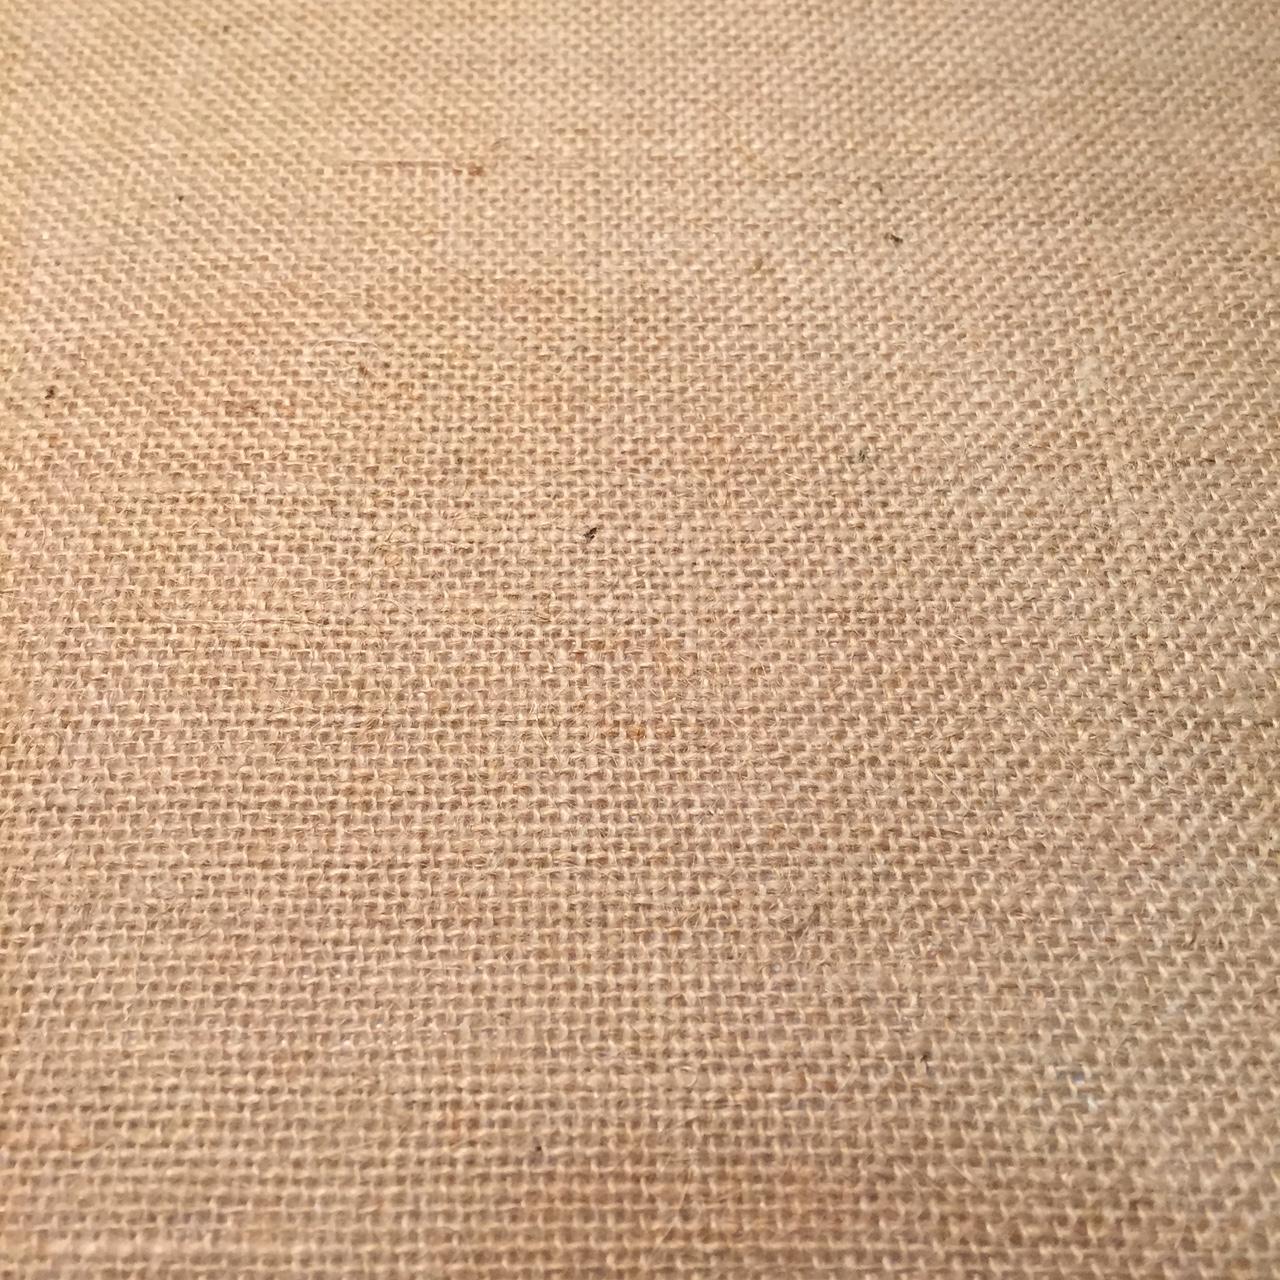 Tela arpillera tela de saco tienda talleres y cursos - Saco de arpillera ...